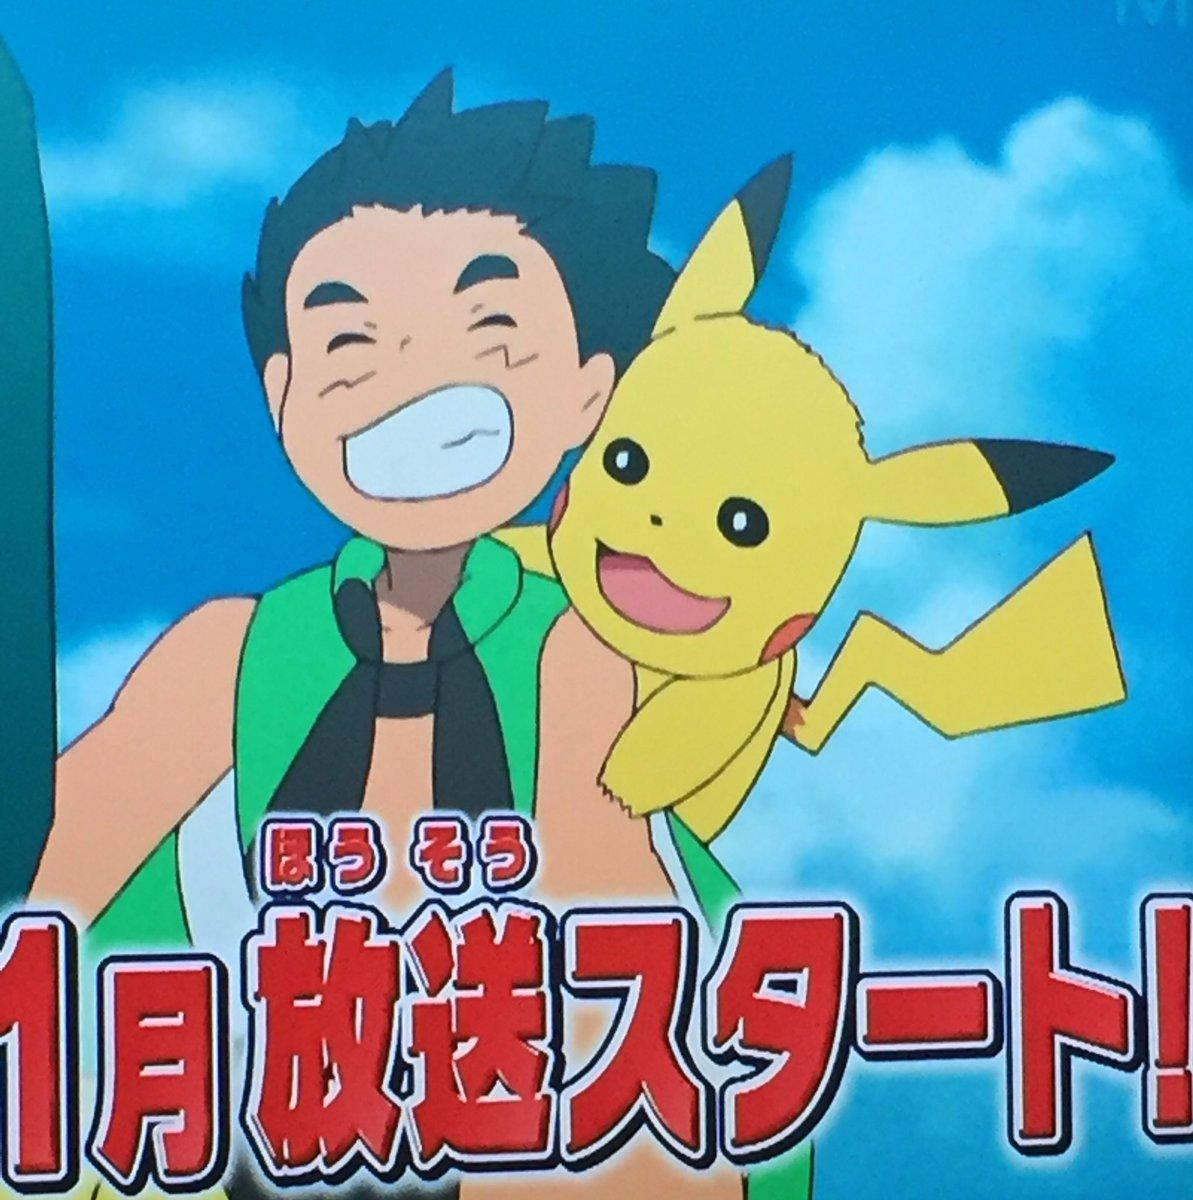 tweet : サトシが学校に通う!?ポケモン新作アニメがツッコミどころ満載